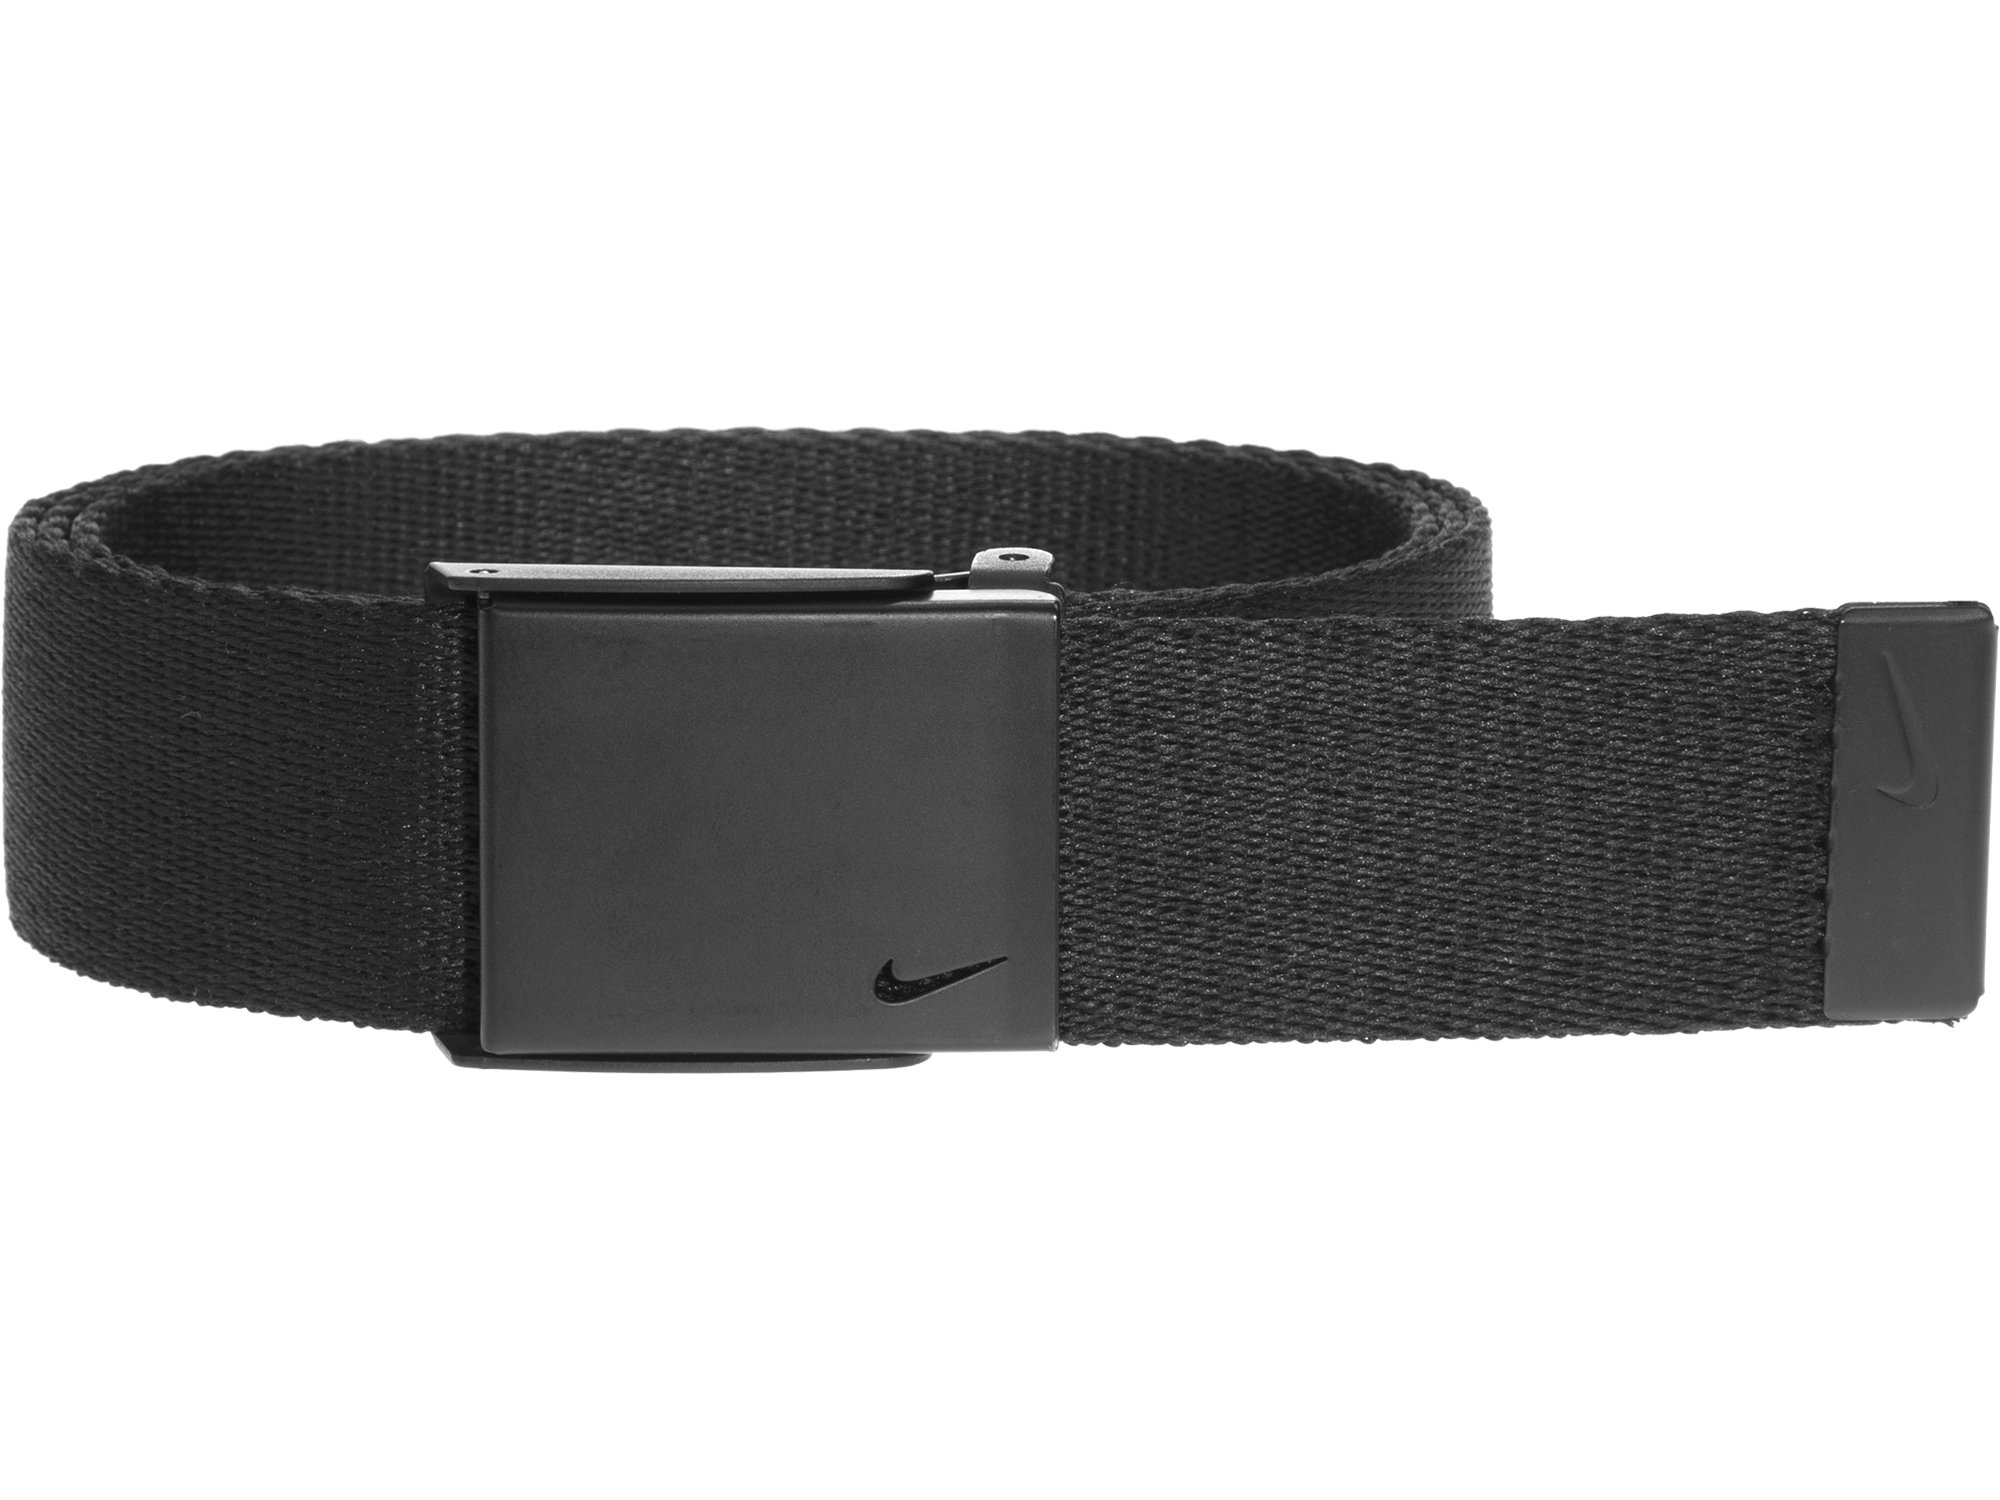 Nike Men's Single Web Belt with Matte Finish, Black, One Size